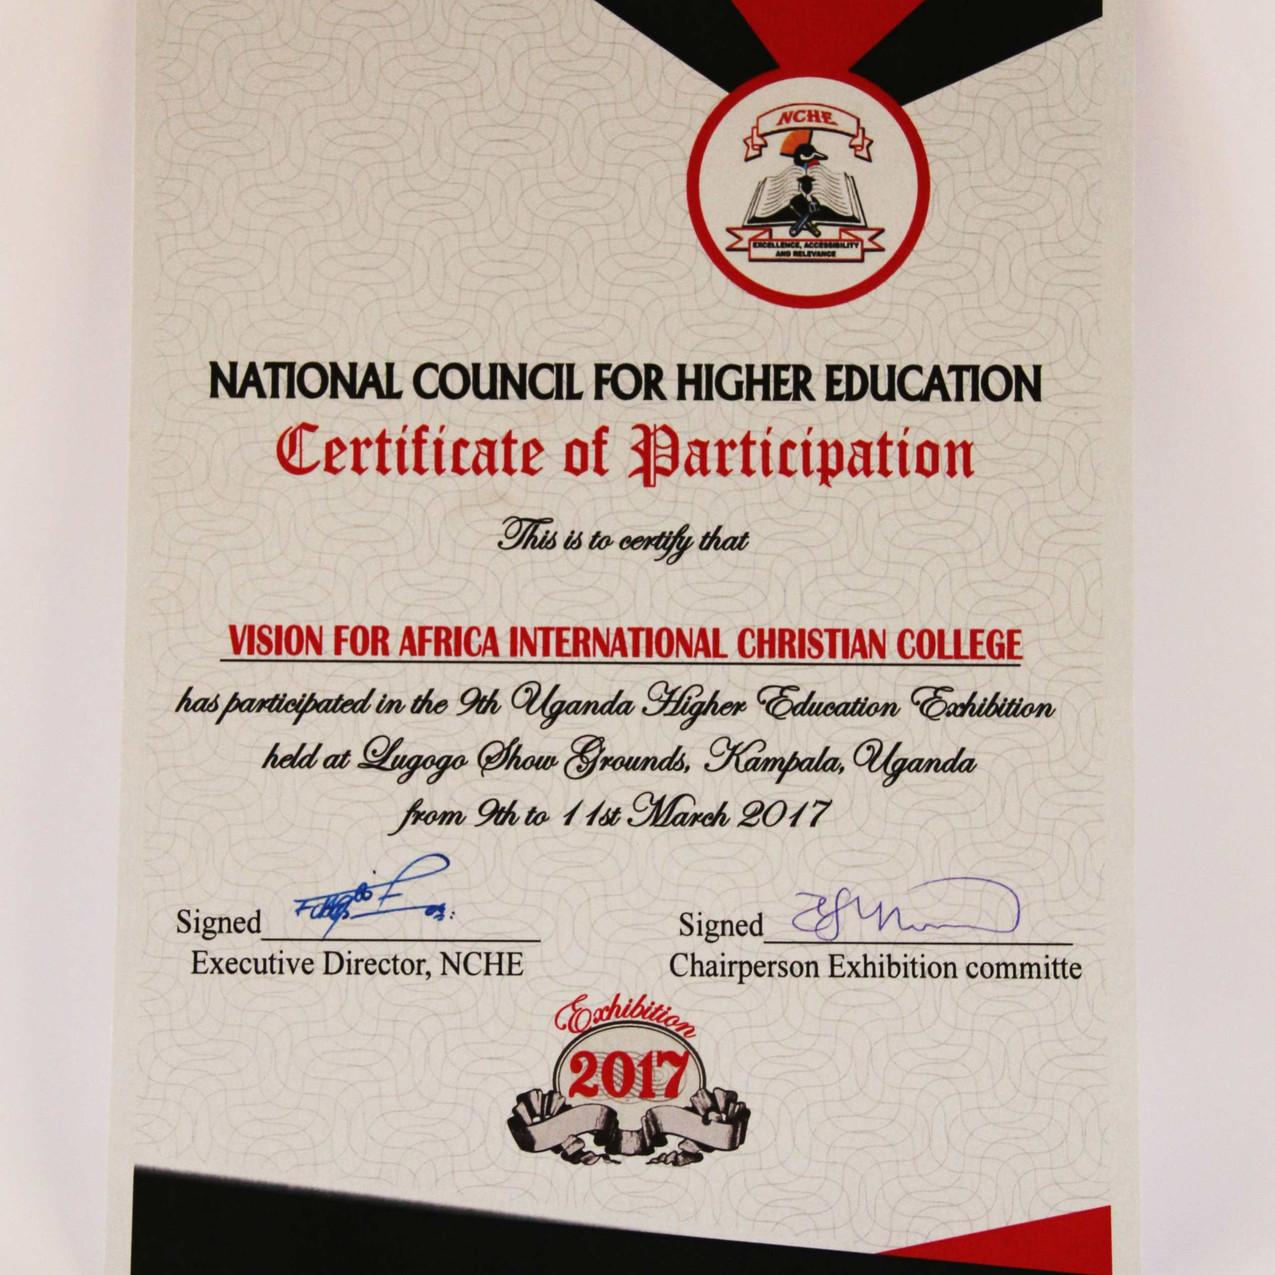 Zertifikat zur Teilnahme